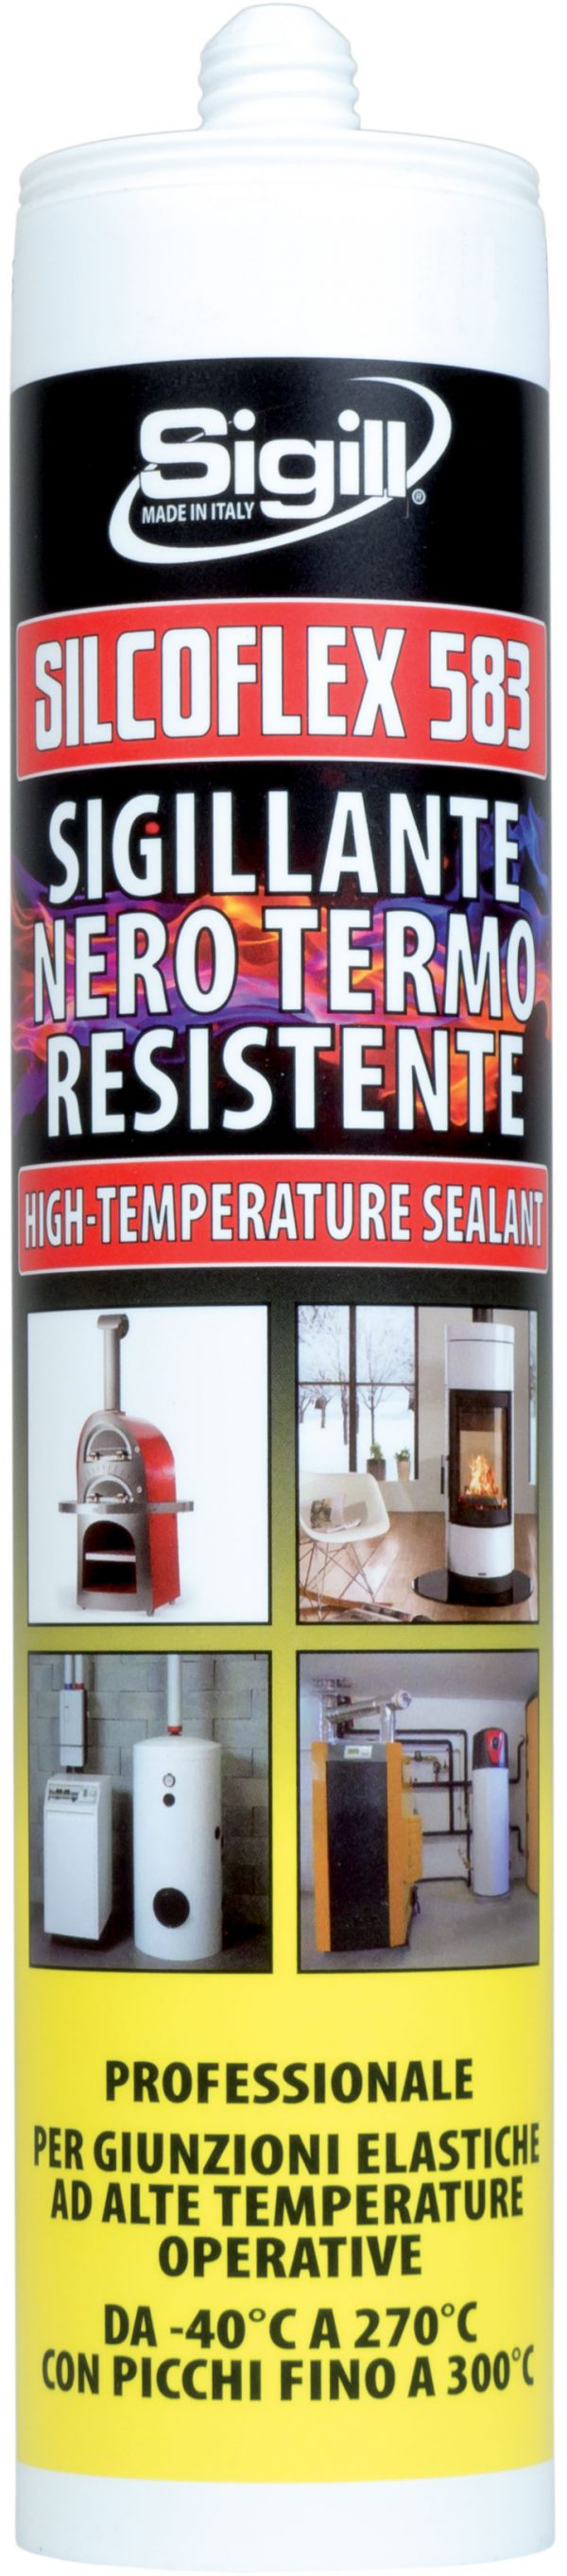 construction sealant, glazing sealant, SILCOFLEX 581 CRISTALLINO